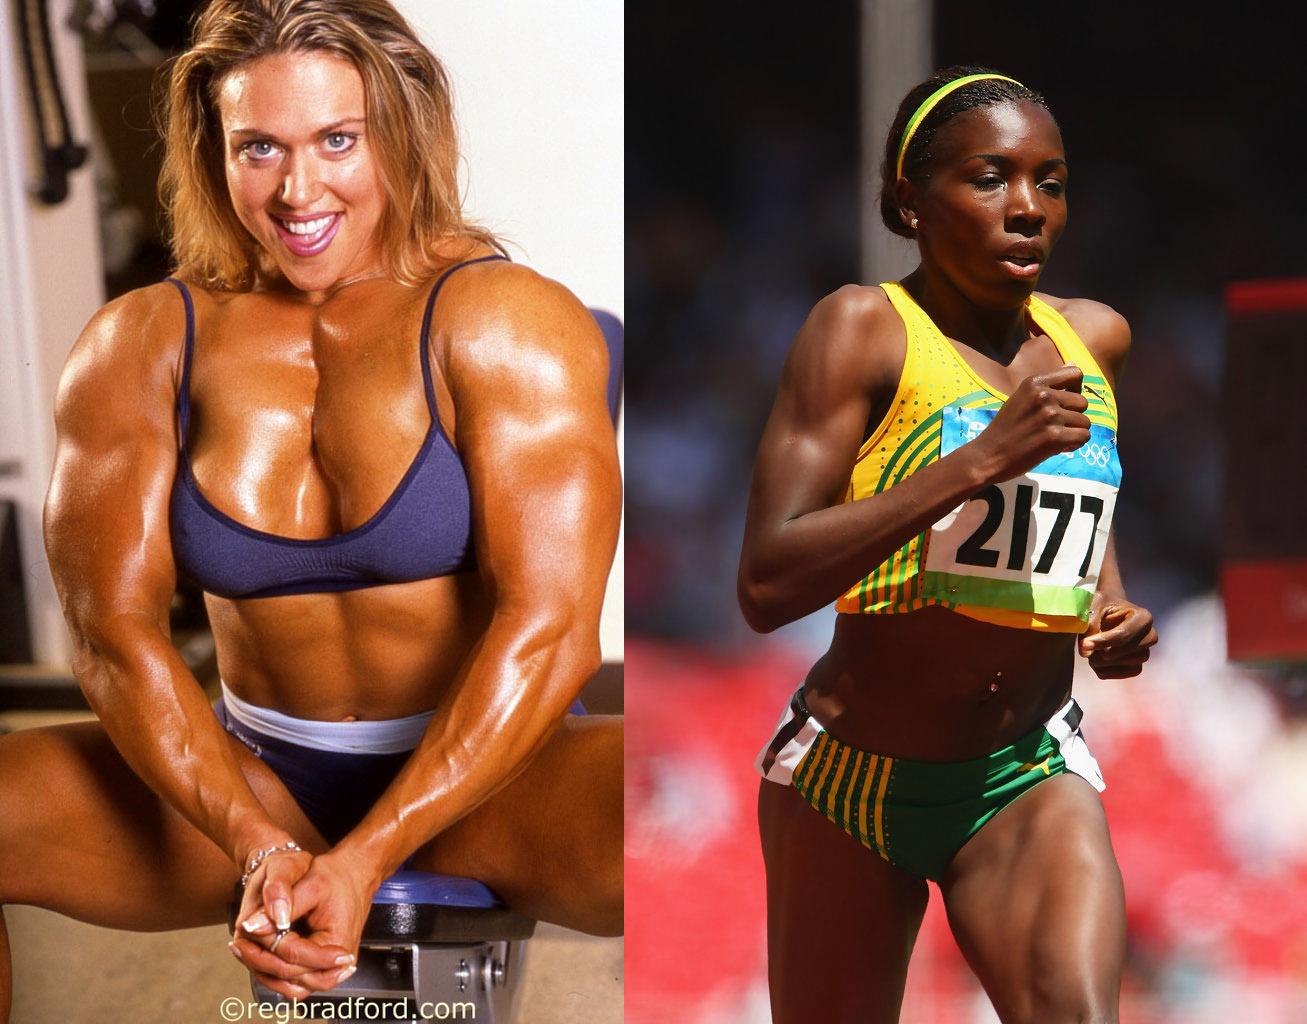 Strength versus running